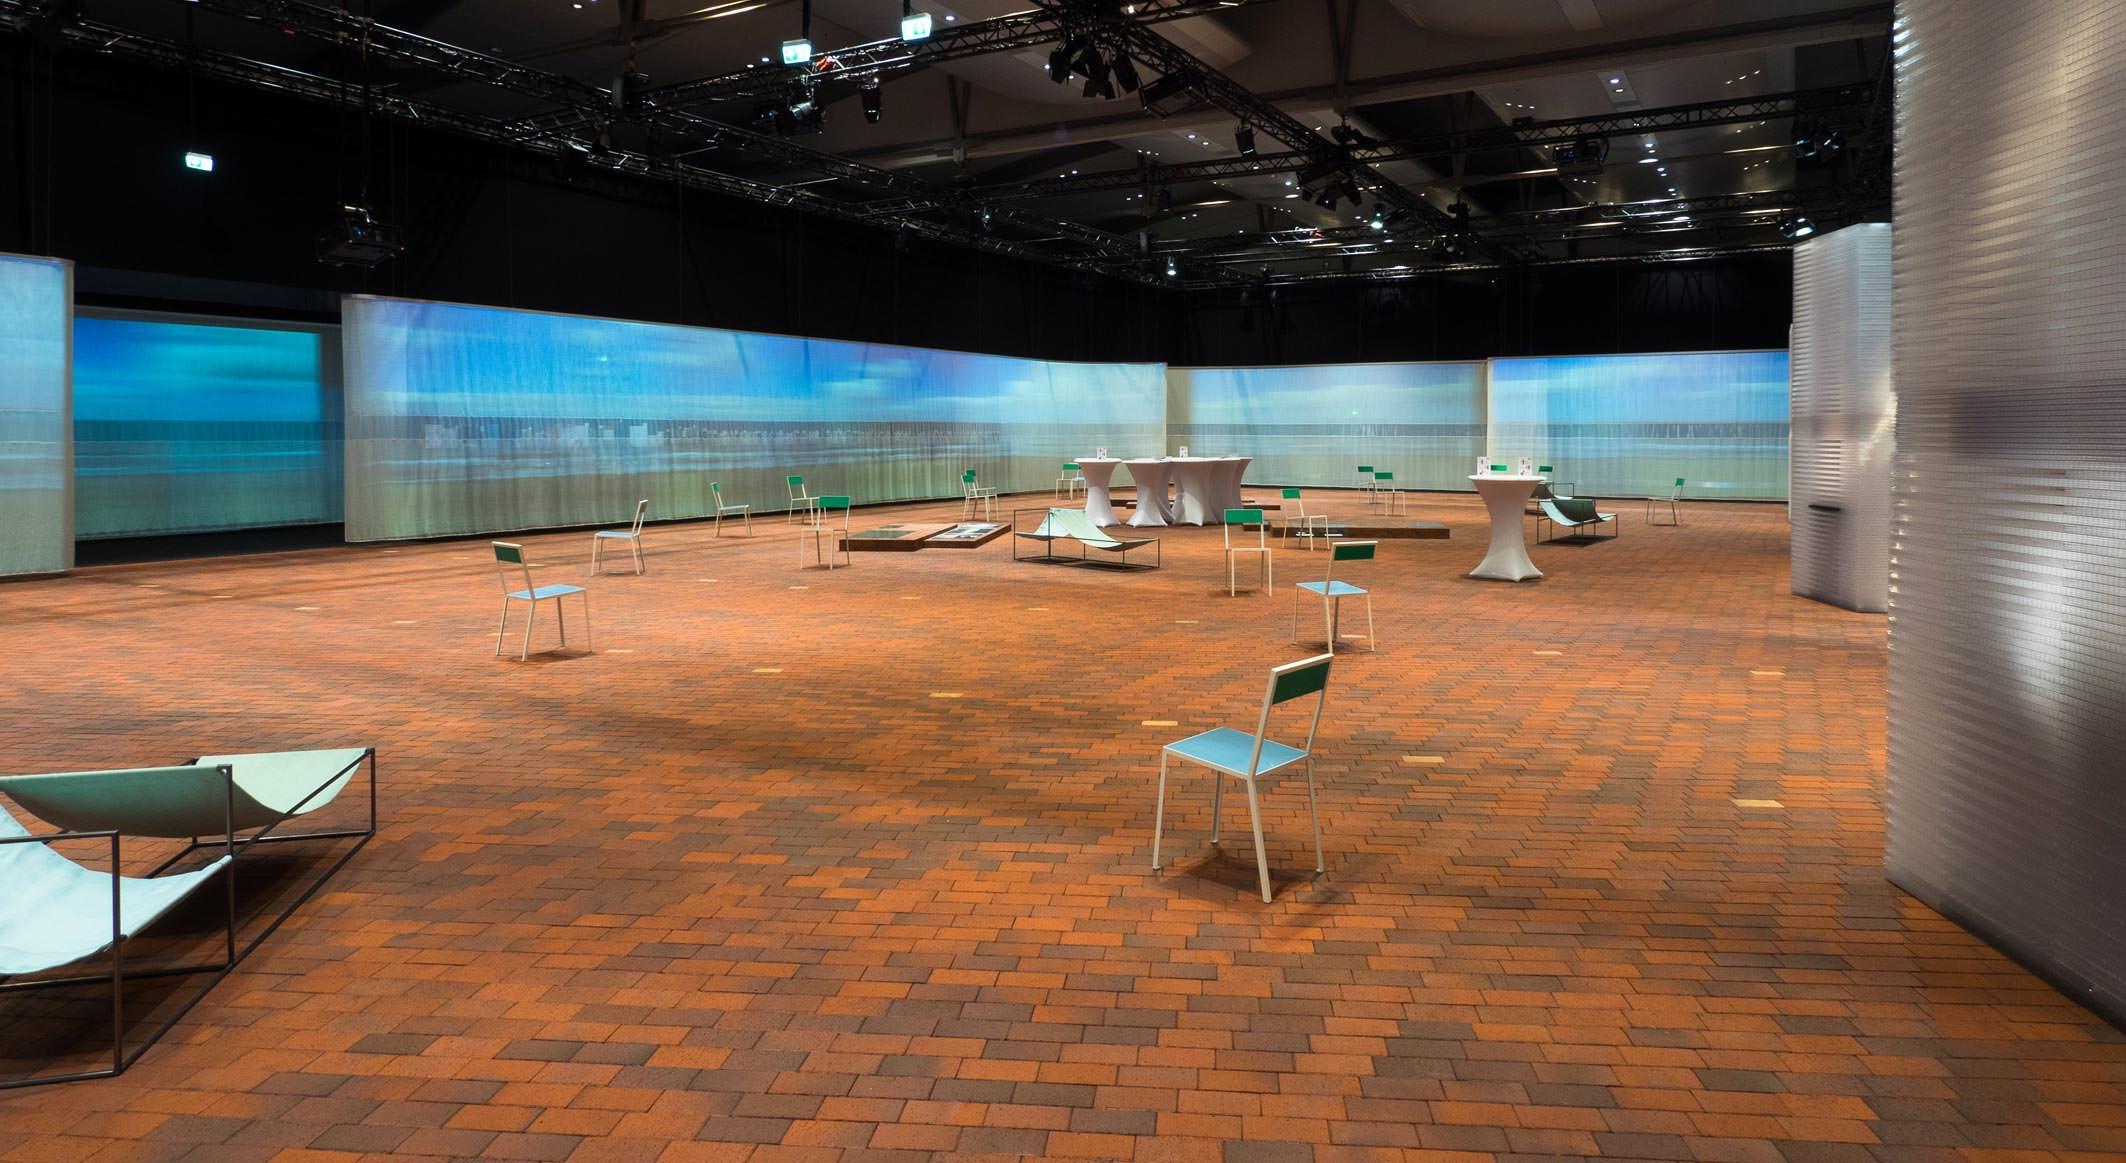 Fußboden Modern Eropa ~ Fußboden aus klinker fußboden aus klinker bodenklinker boden